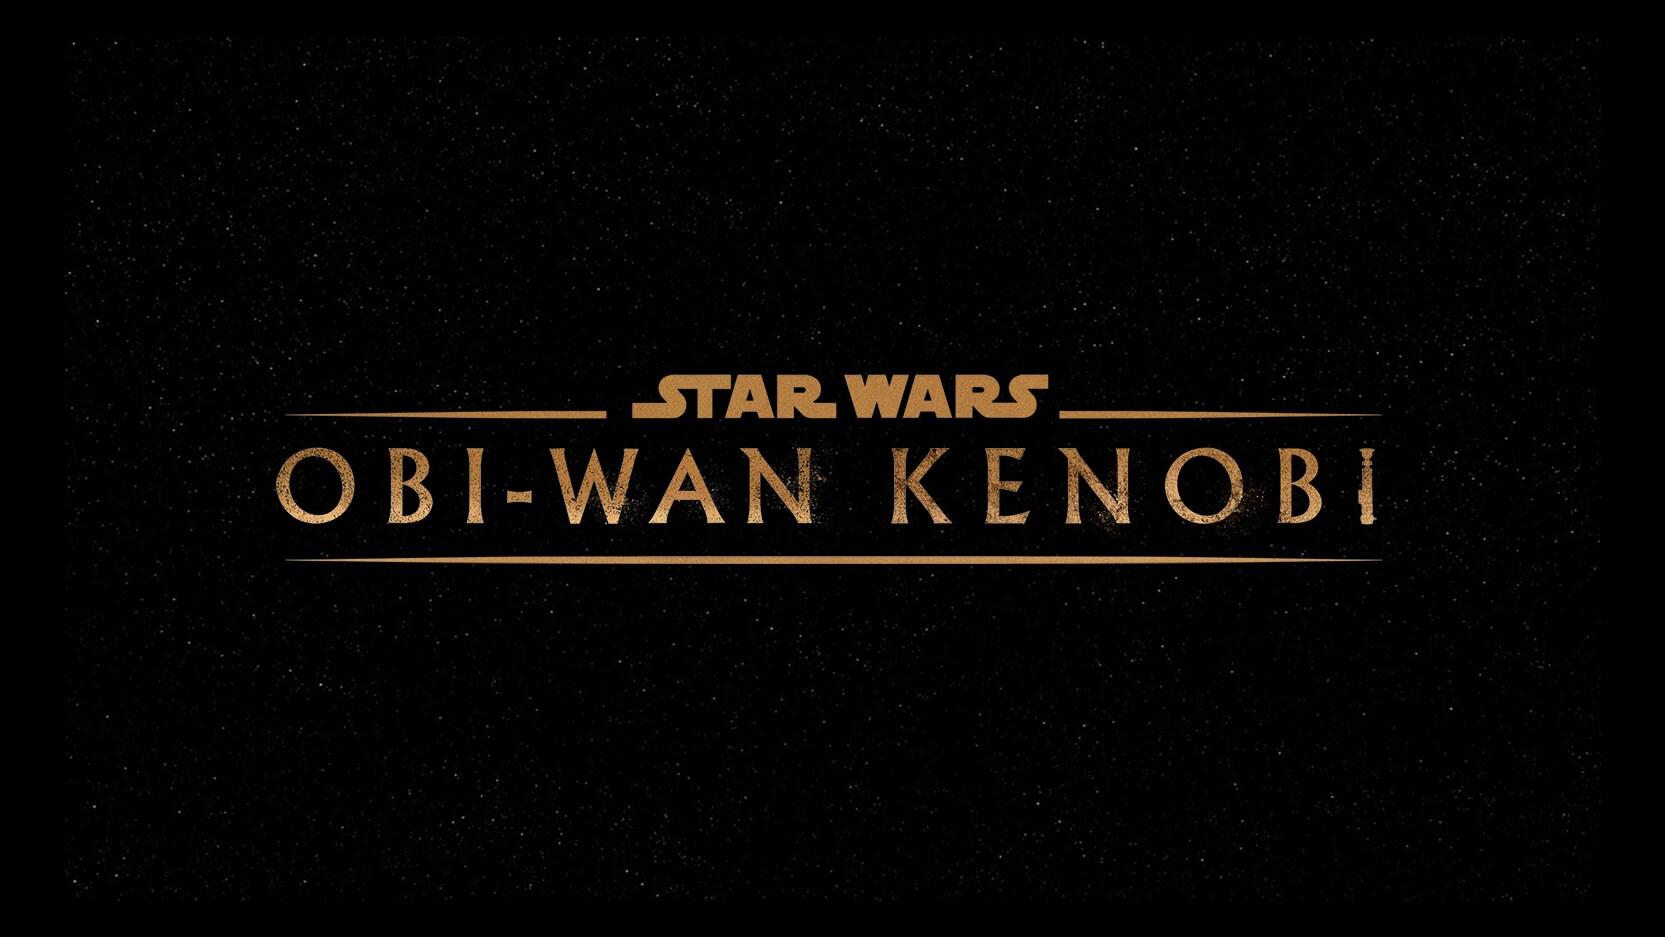 "NEW LUCASFILM SPECIAL EVENT SERIES ""OBI-WAN KENOBI"" TO BEGIN PRODUCTION"